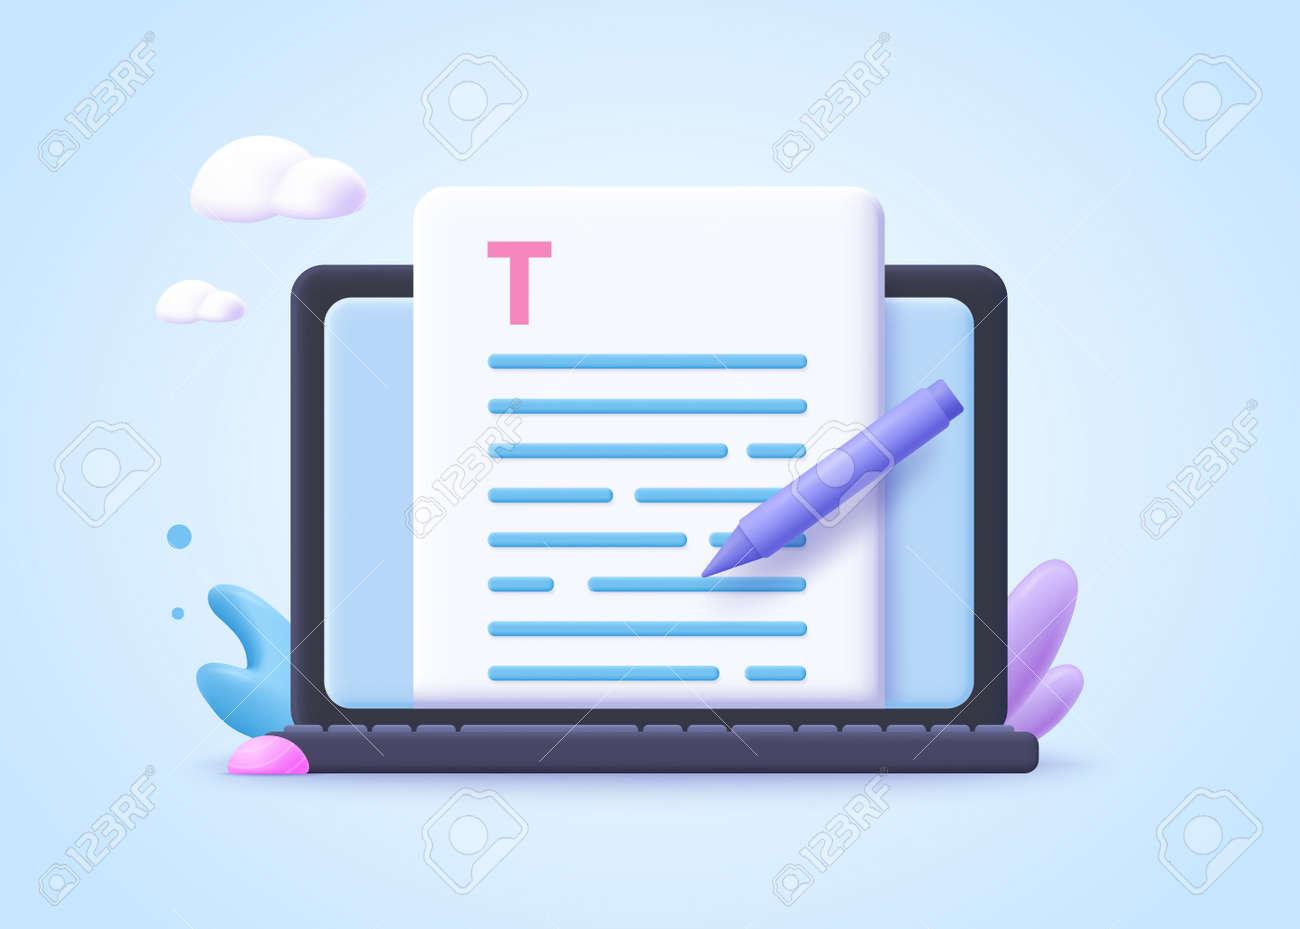 Editable online document concept. Creative writing, storytelling, copywriting, online education. 3d vector illustration. - 169679138